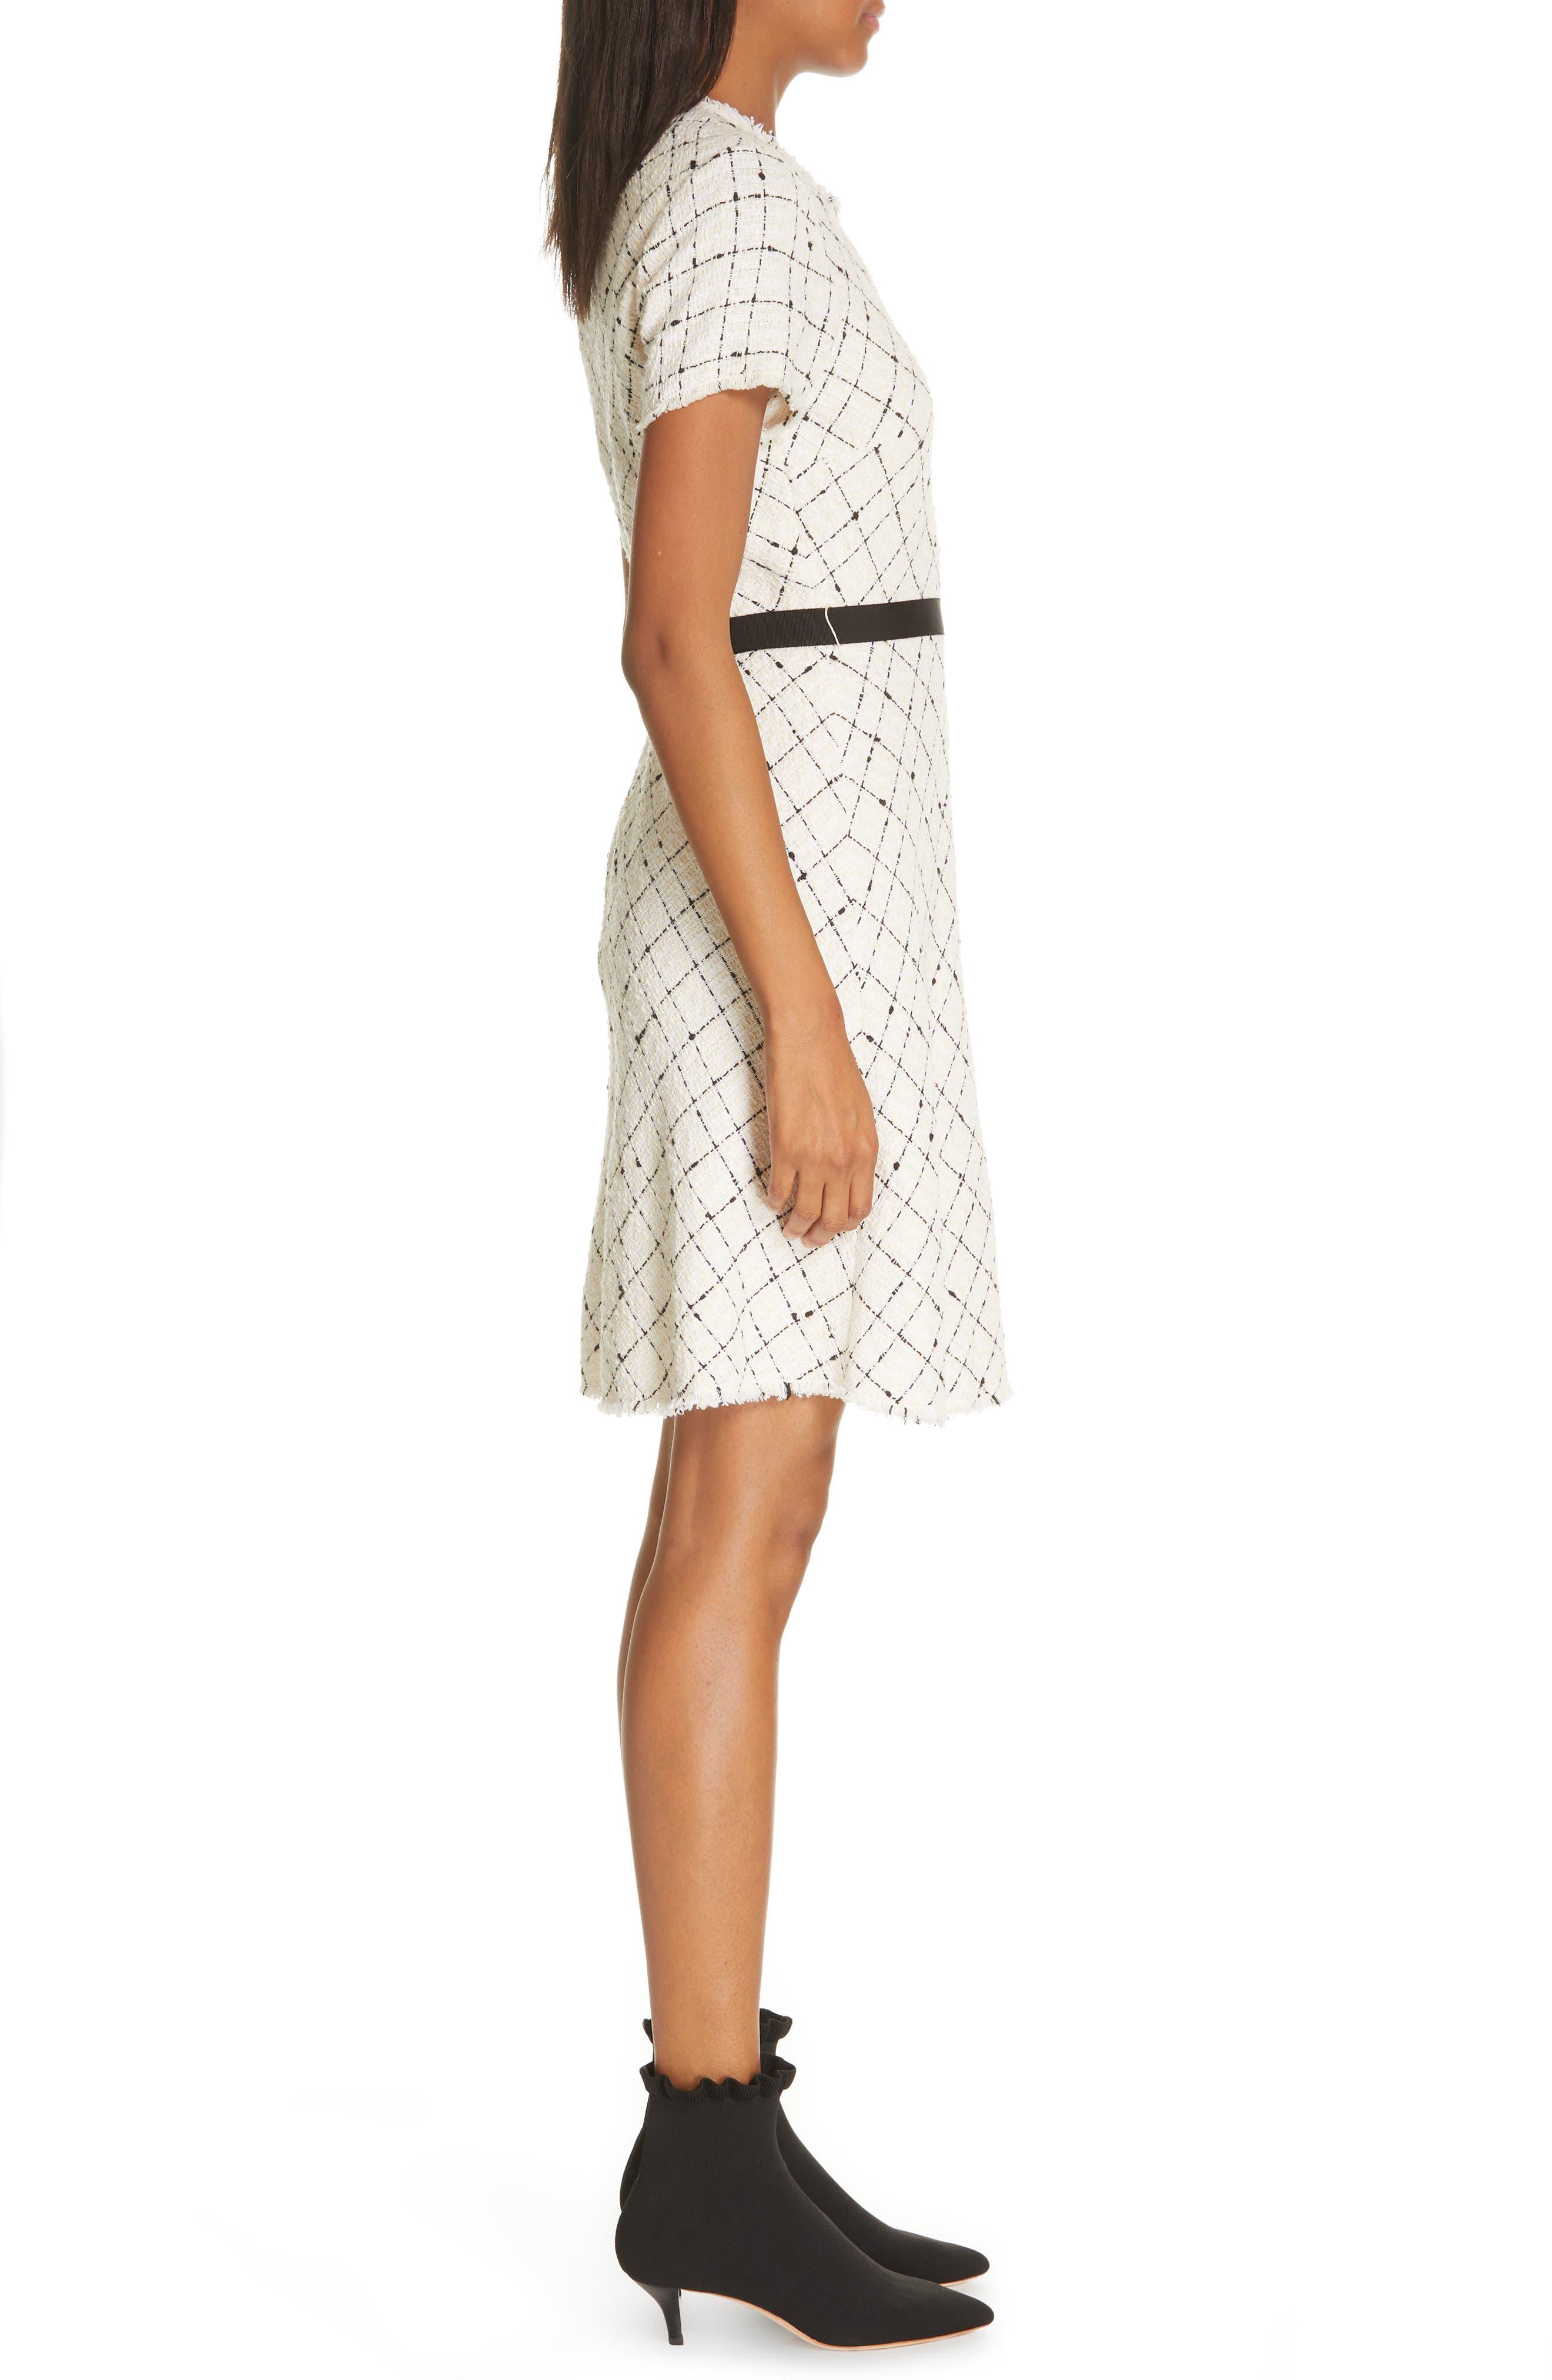 REBECCA TAYLOR, Plaid Tweed Dress, Alternate thumbnail 4, color, CREAM COMBO